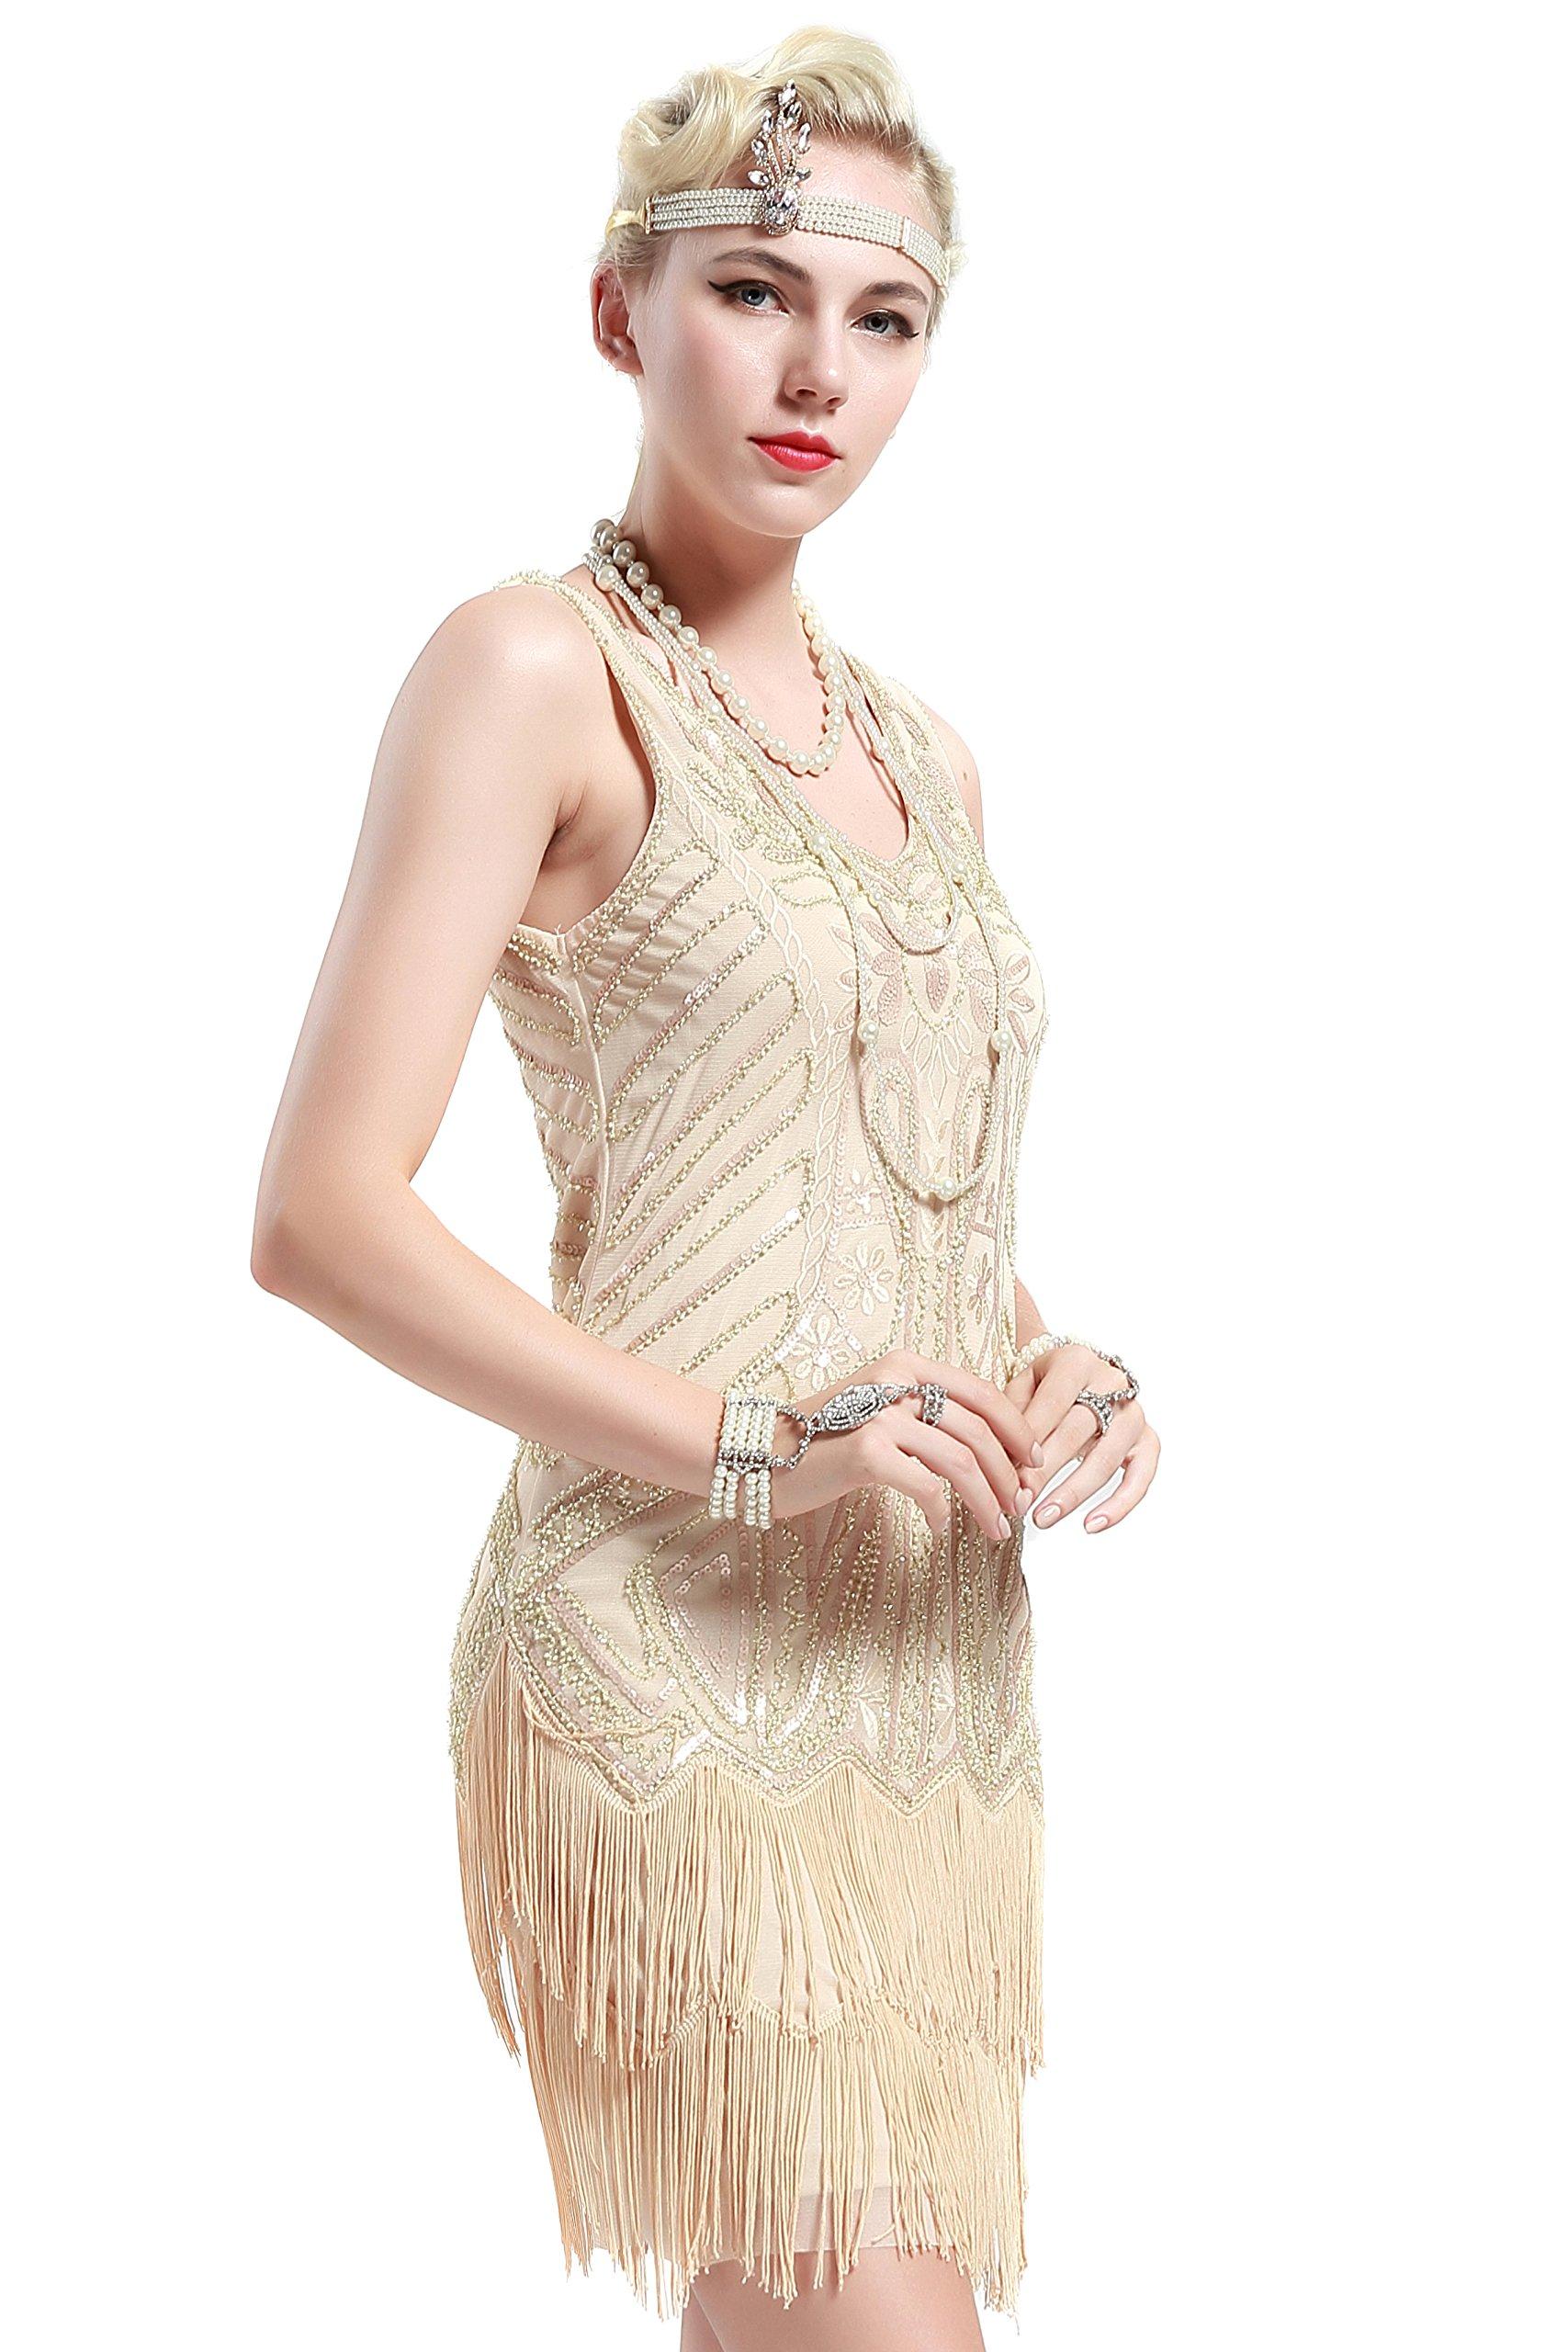 Amazon.com : BABEYOND Vintage 1920s Flapper Headband ...